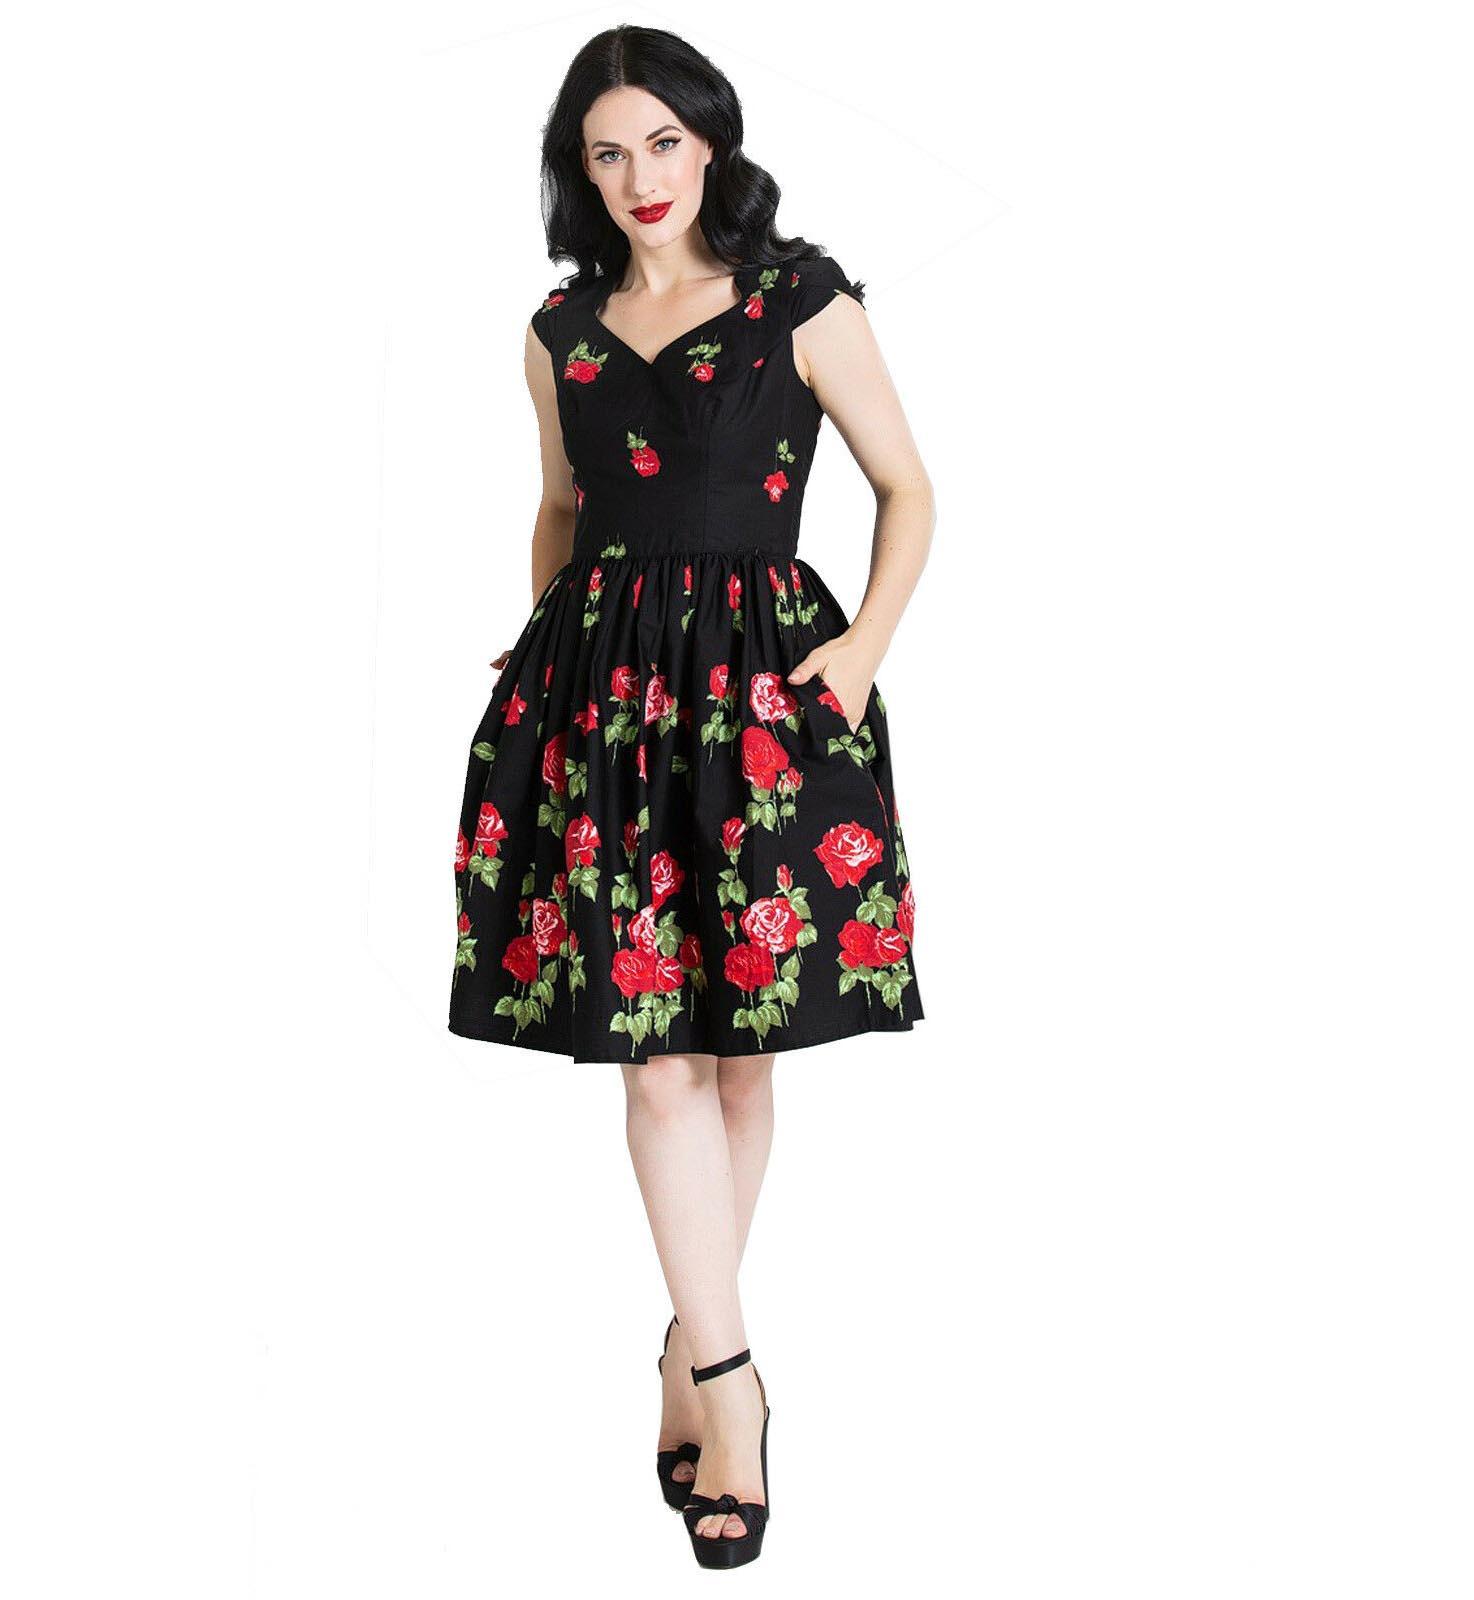 Hell-Bunny-Pin-Up-Mid-Length-50s-Dress-ANTONIA-Rose-Floral-Black thumbnail 11